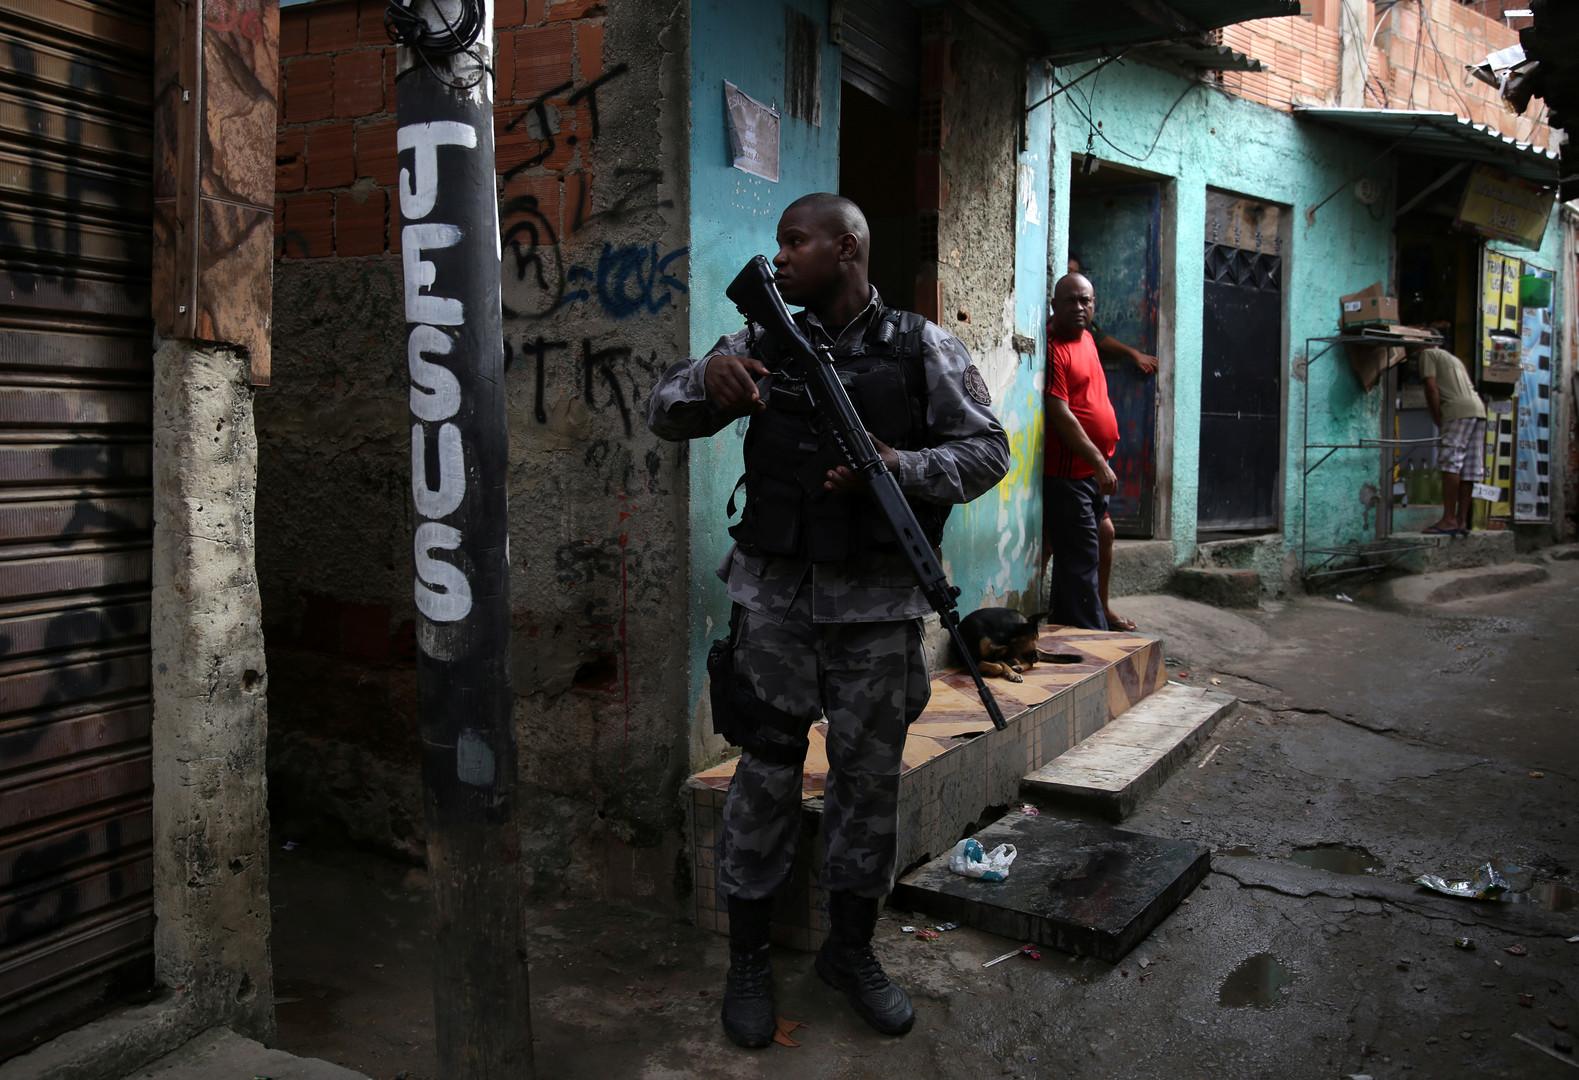 Brasilien: Militärischer Dauereinsatz in Rio de Janeiro befeuert ...